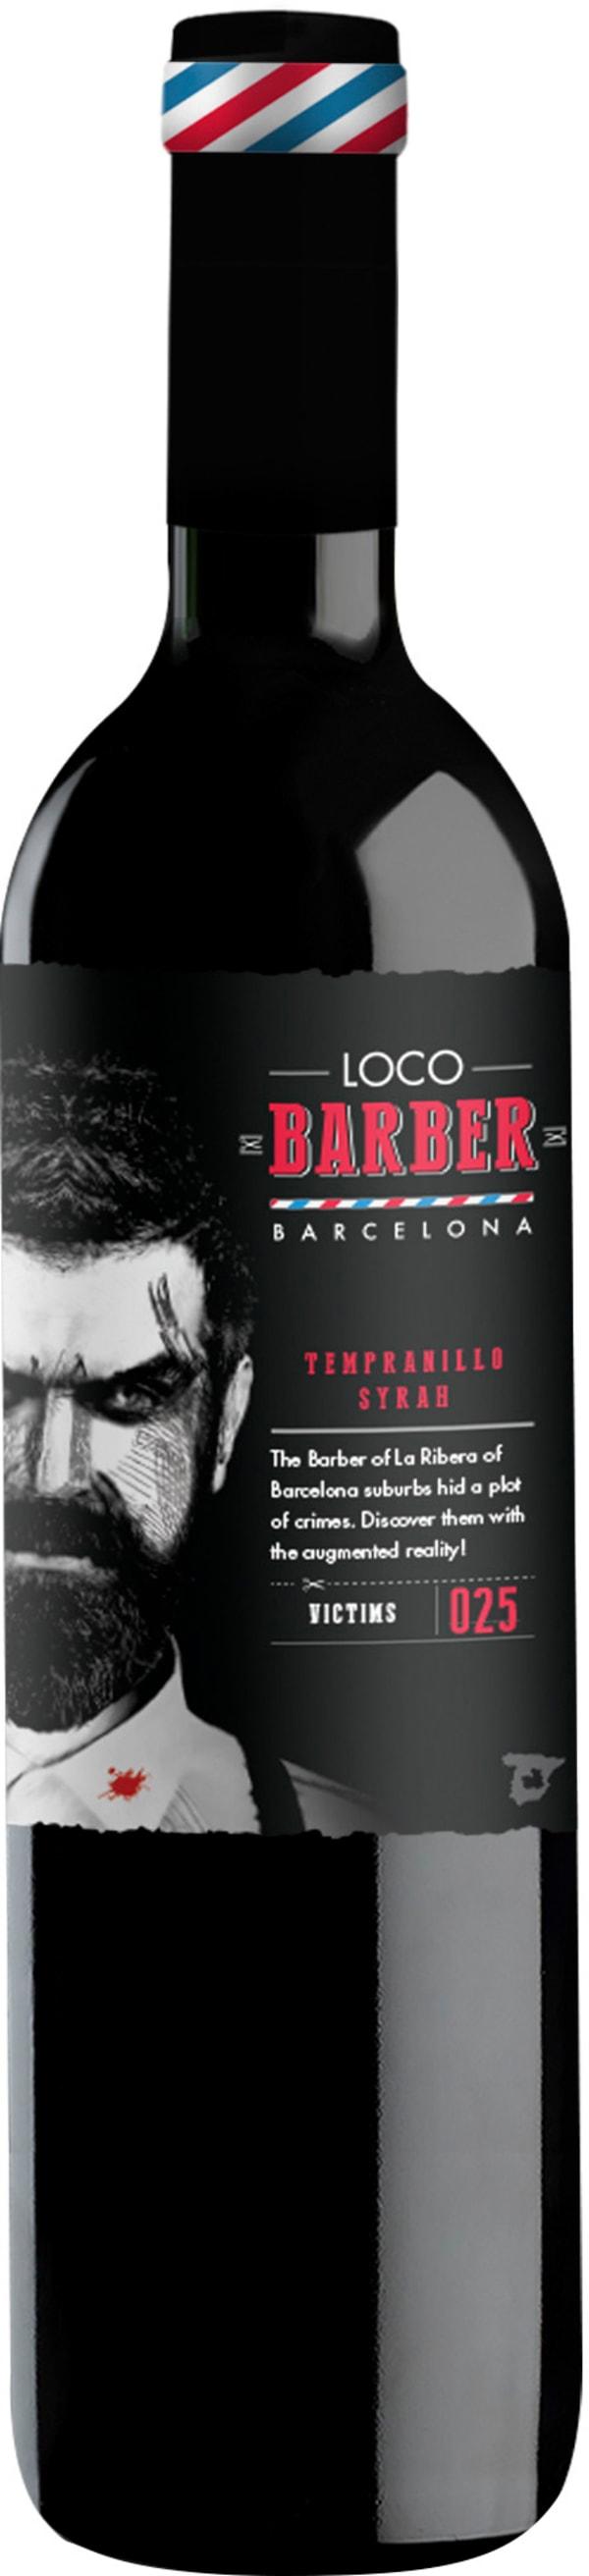 Loco Barber Barcelona 2018